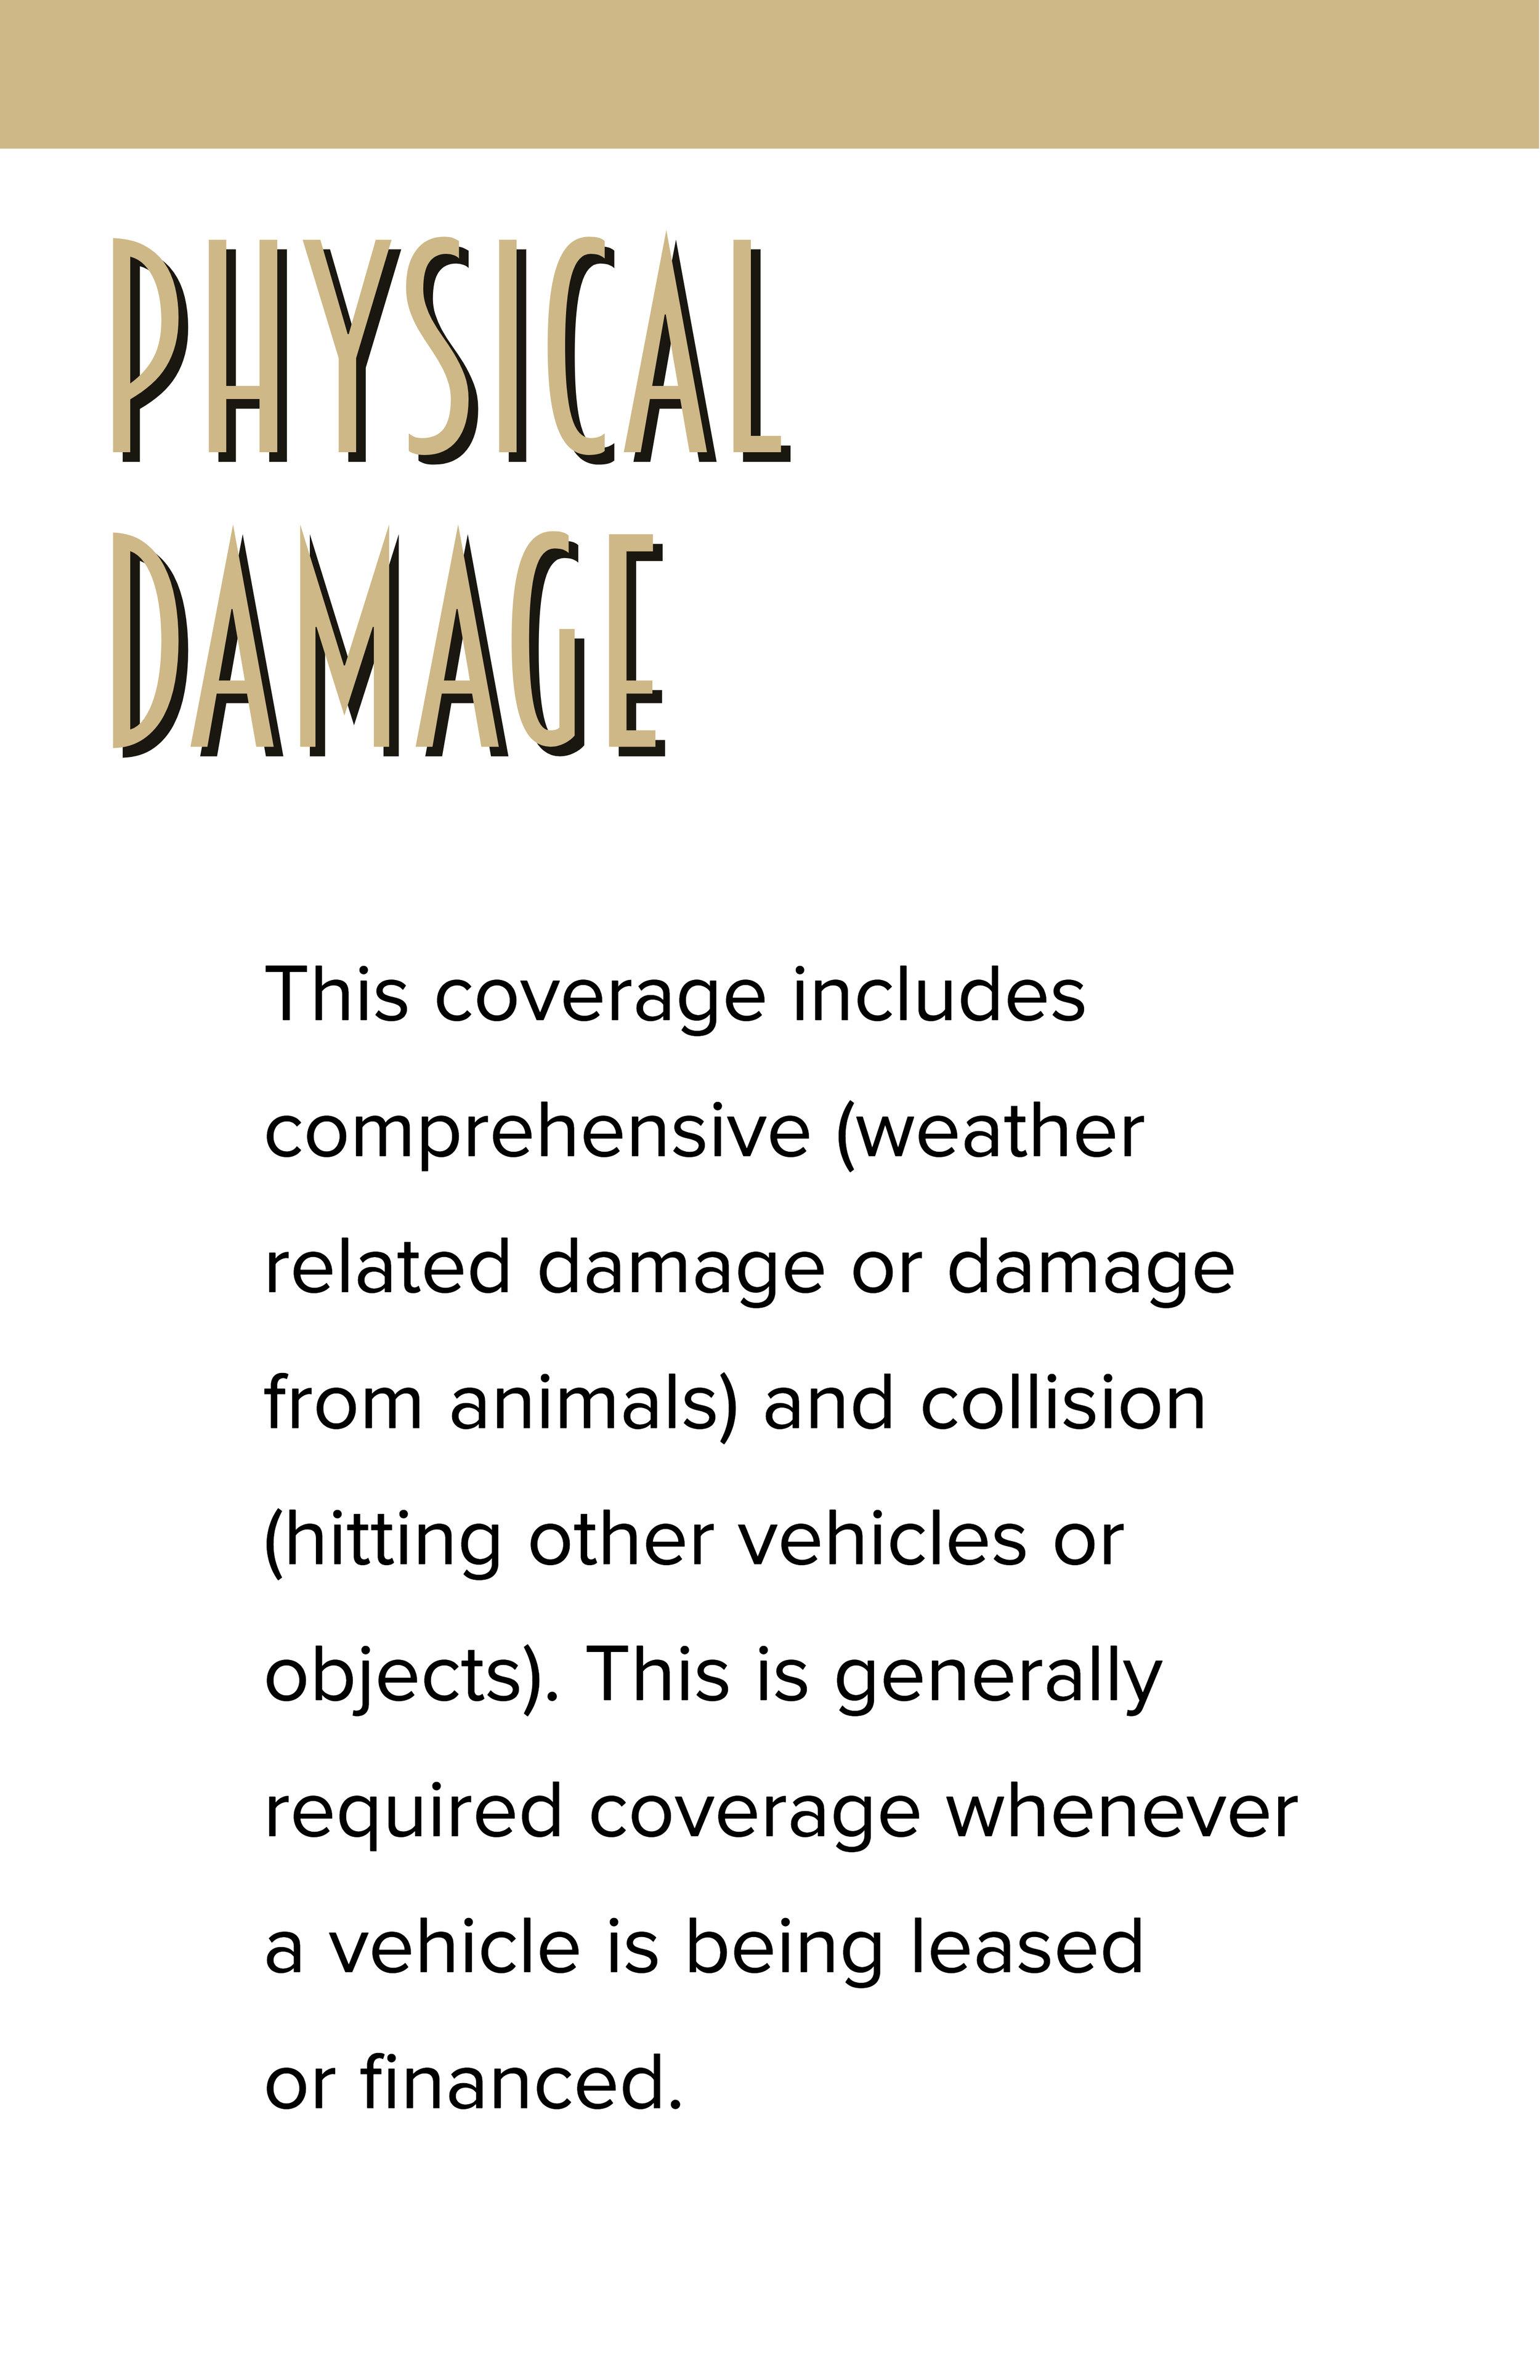 Physical Damage(1).jpg